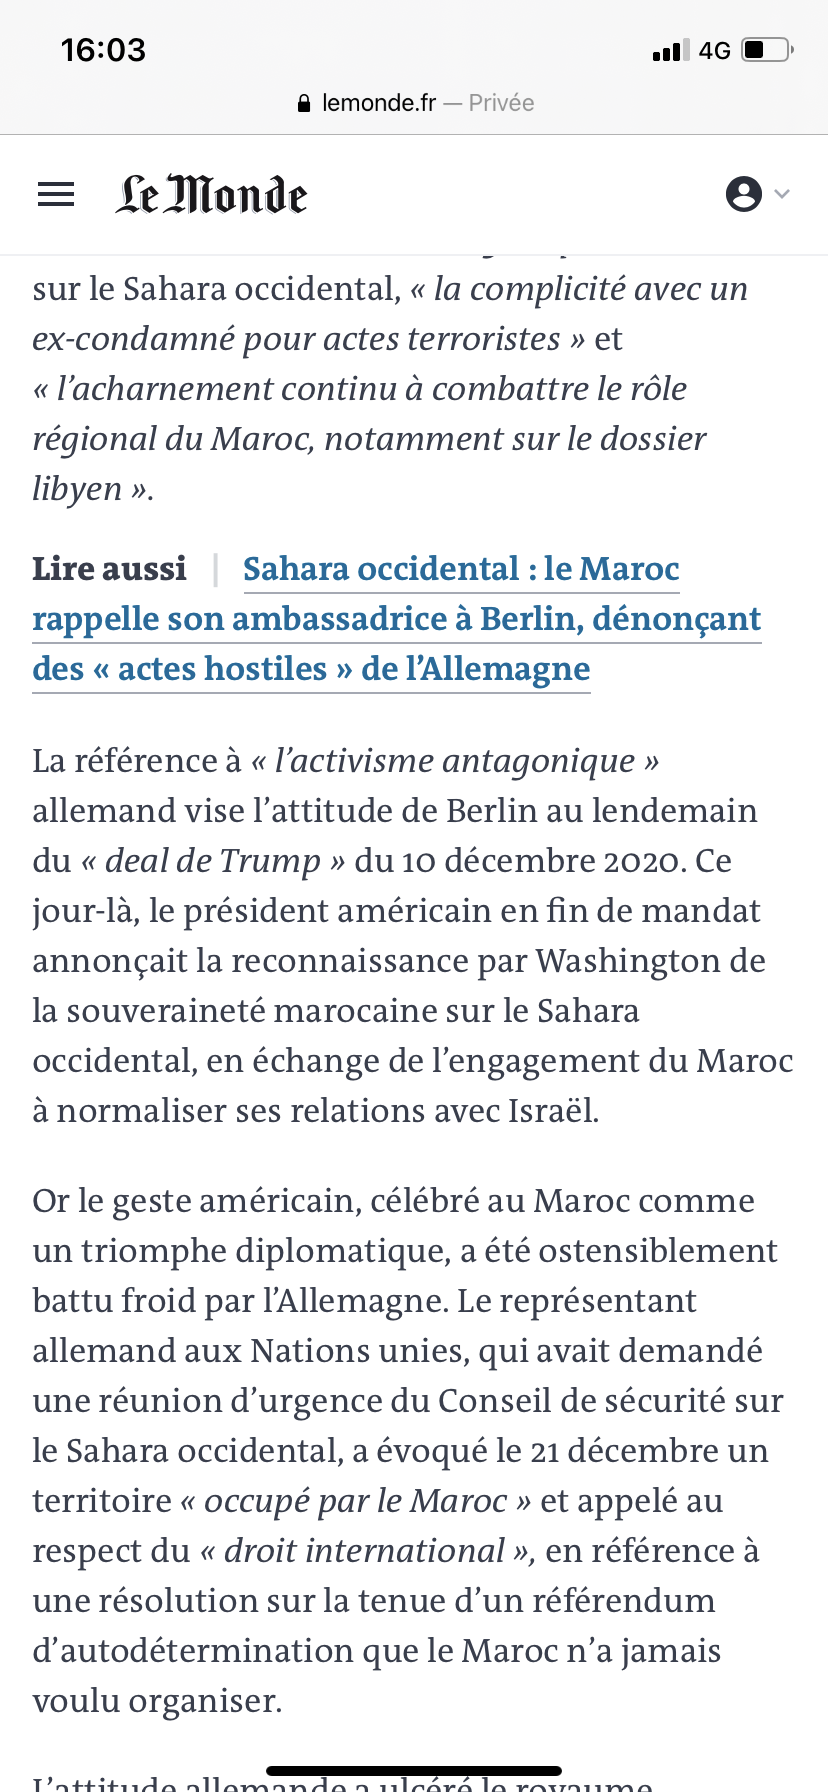 Diplomatie marocaine - Relations internationales 619